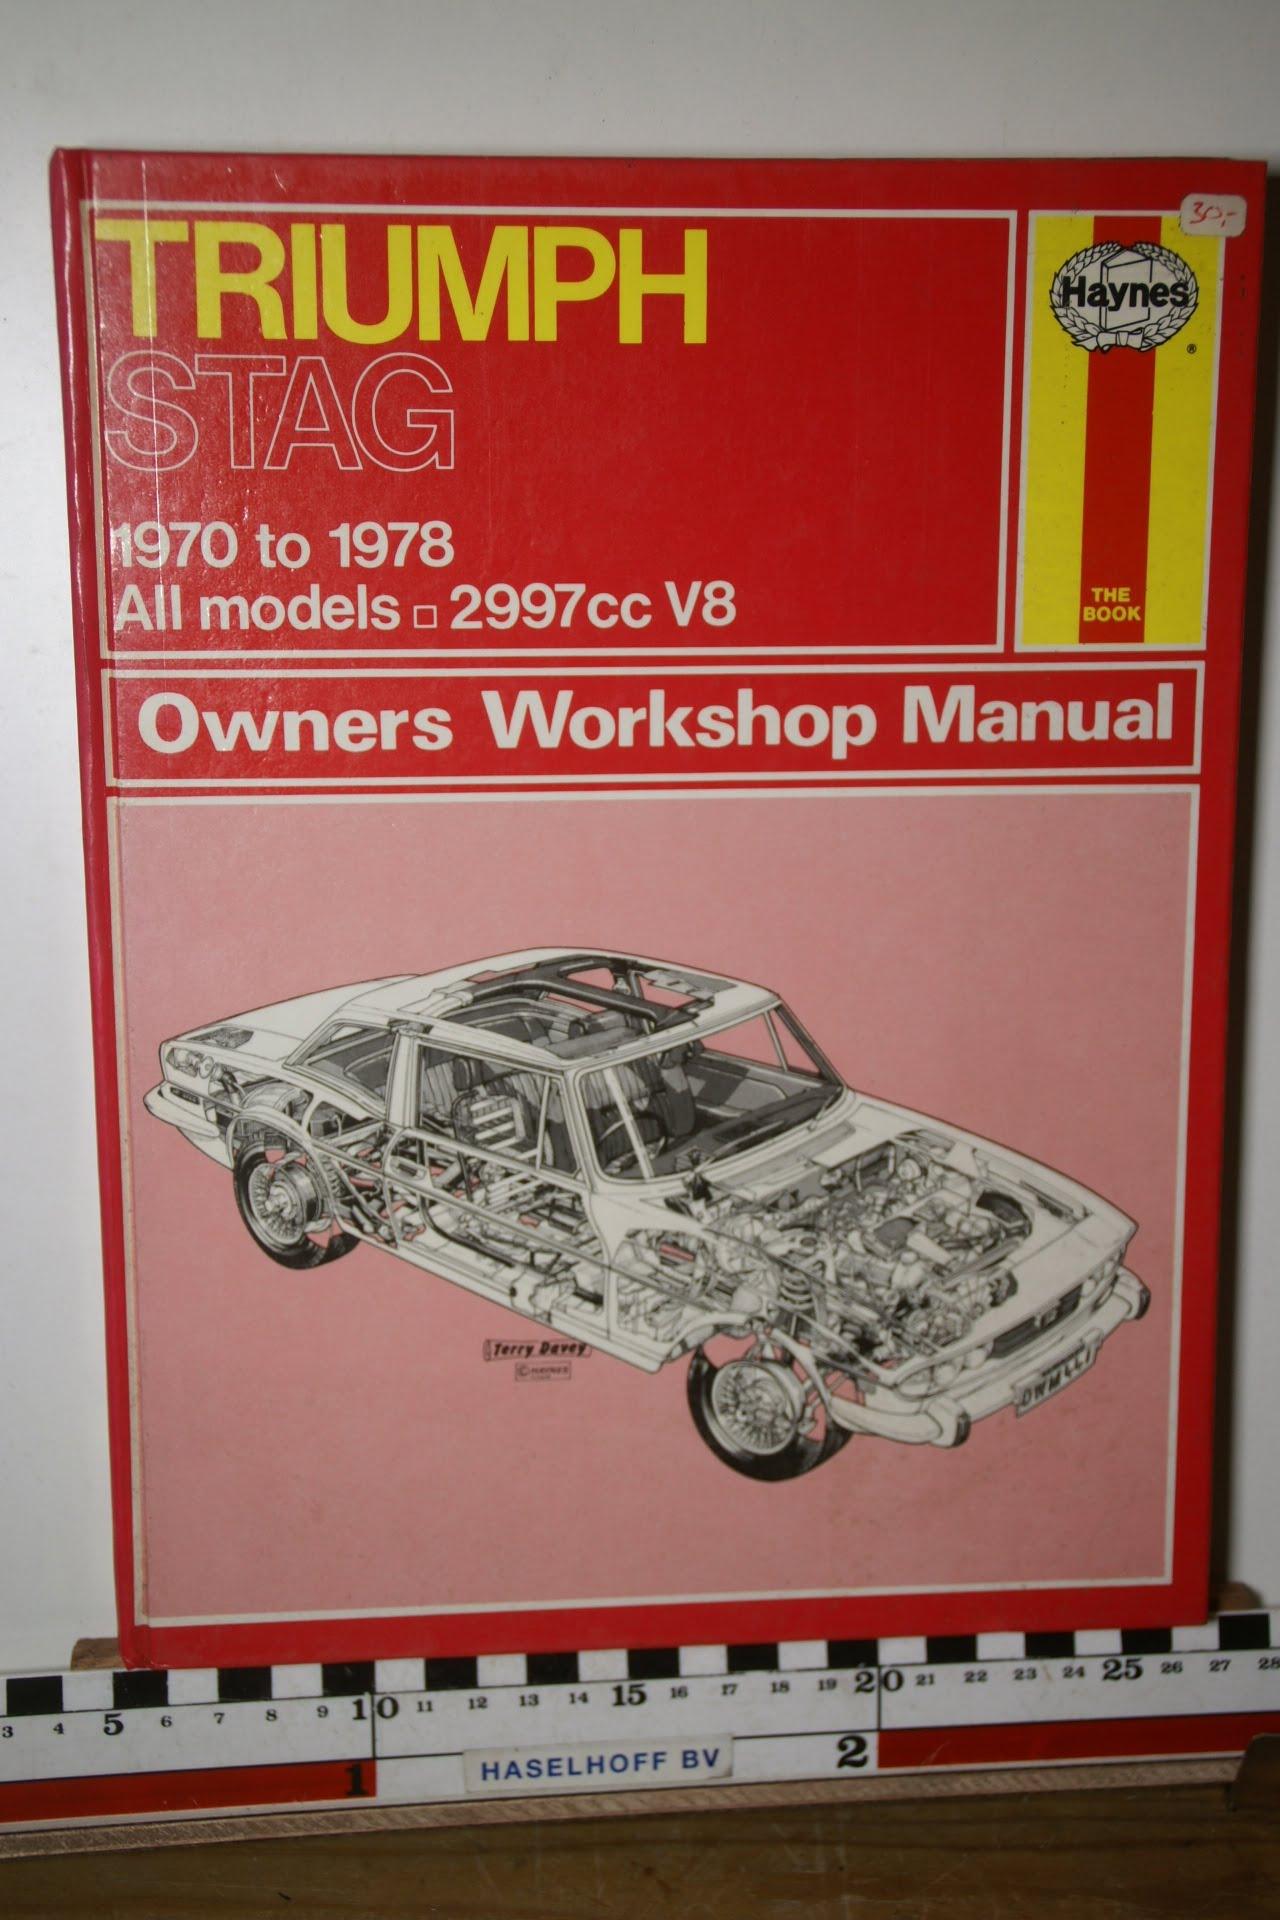 Haynes Triumph STAG Owners Workshop Manual 180205-3705-0